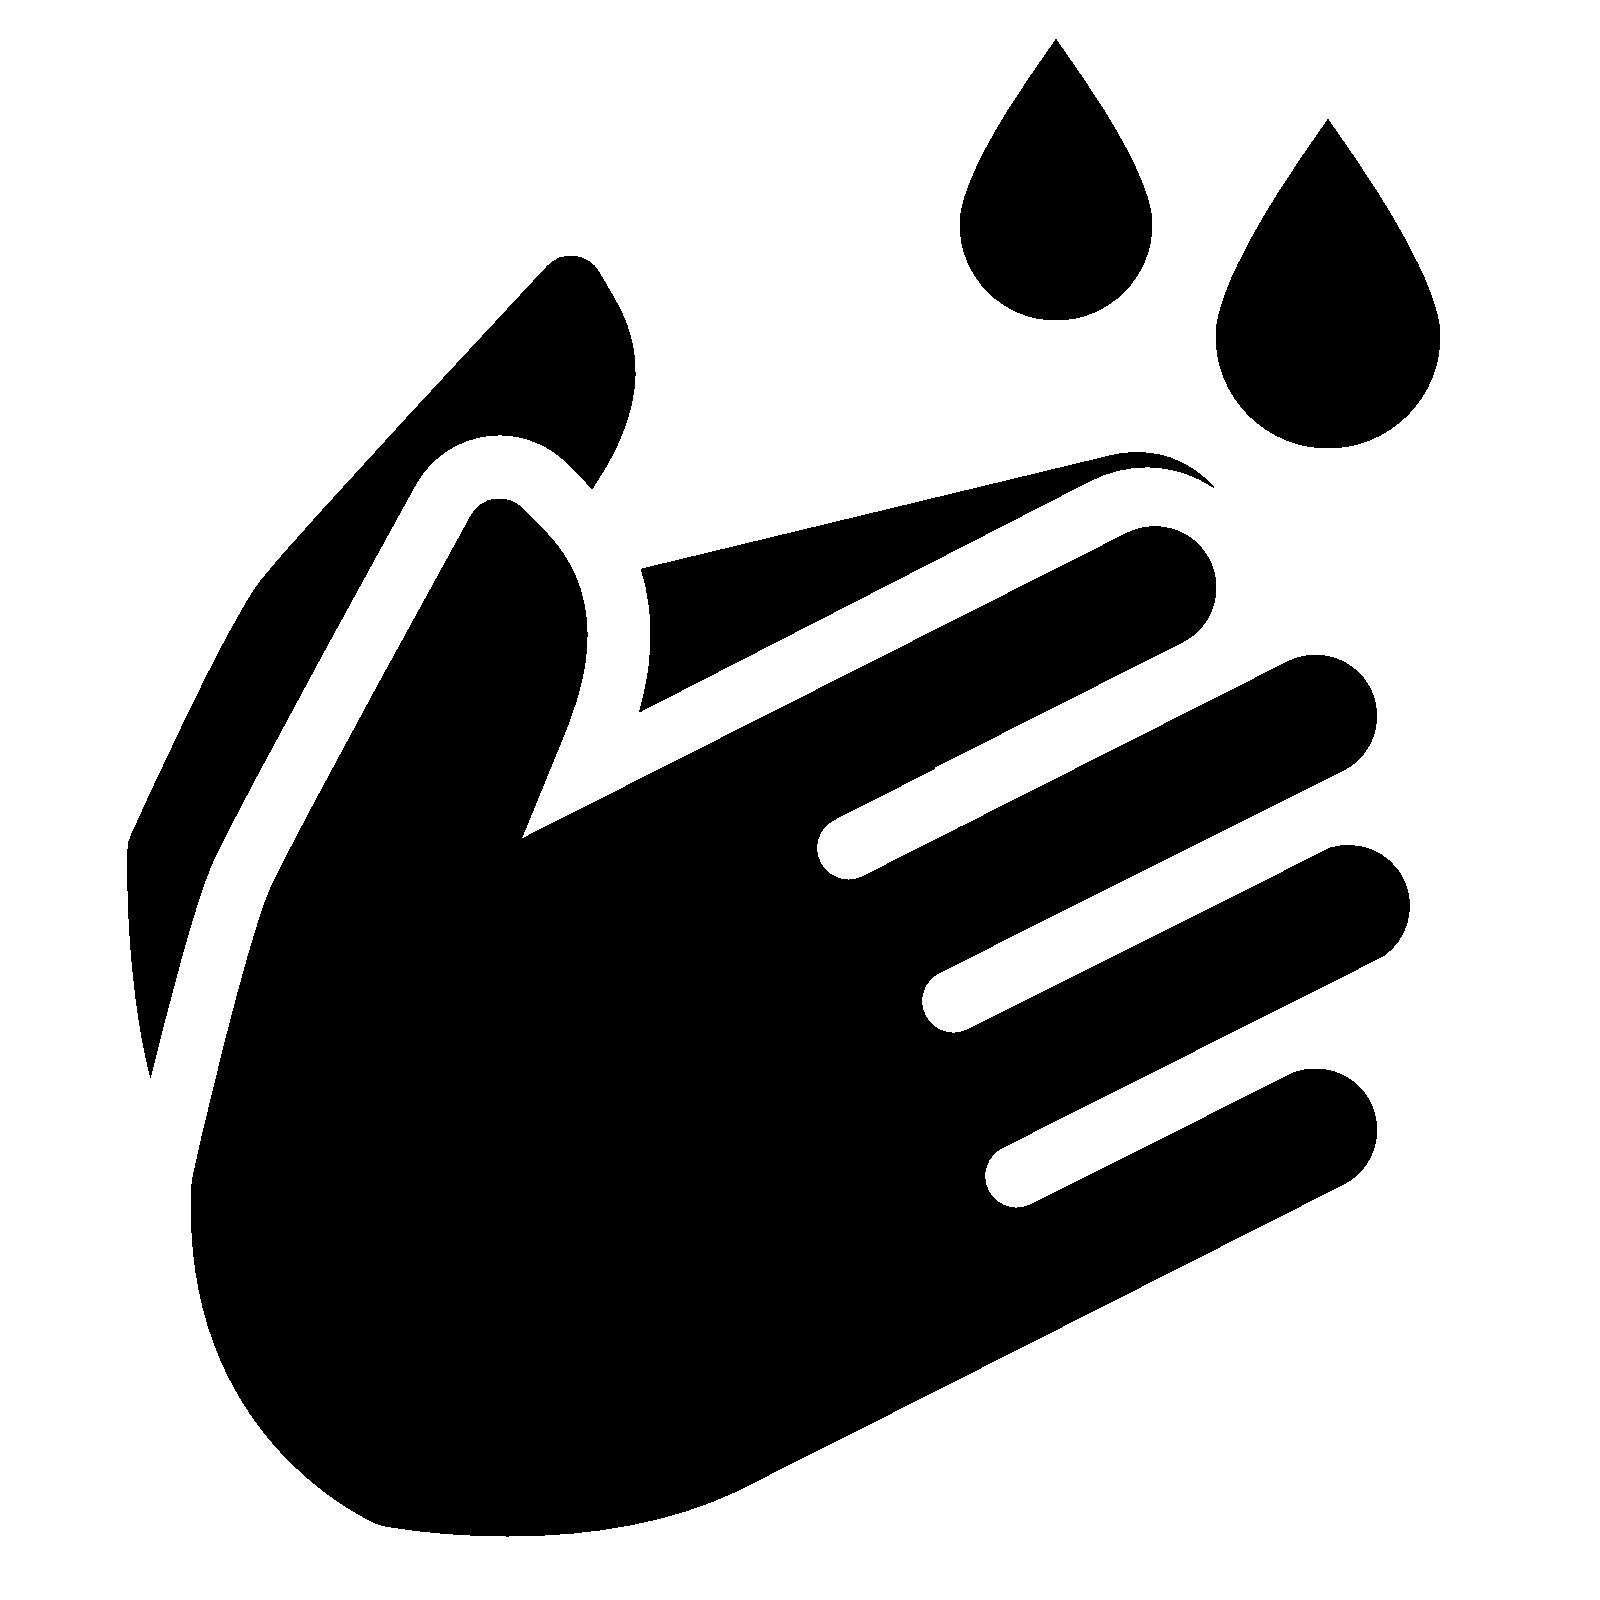 PNG Hand Washing - 50138